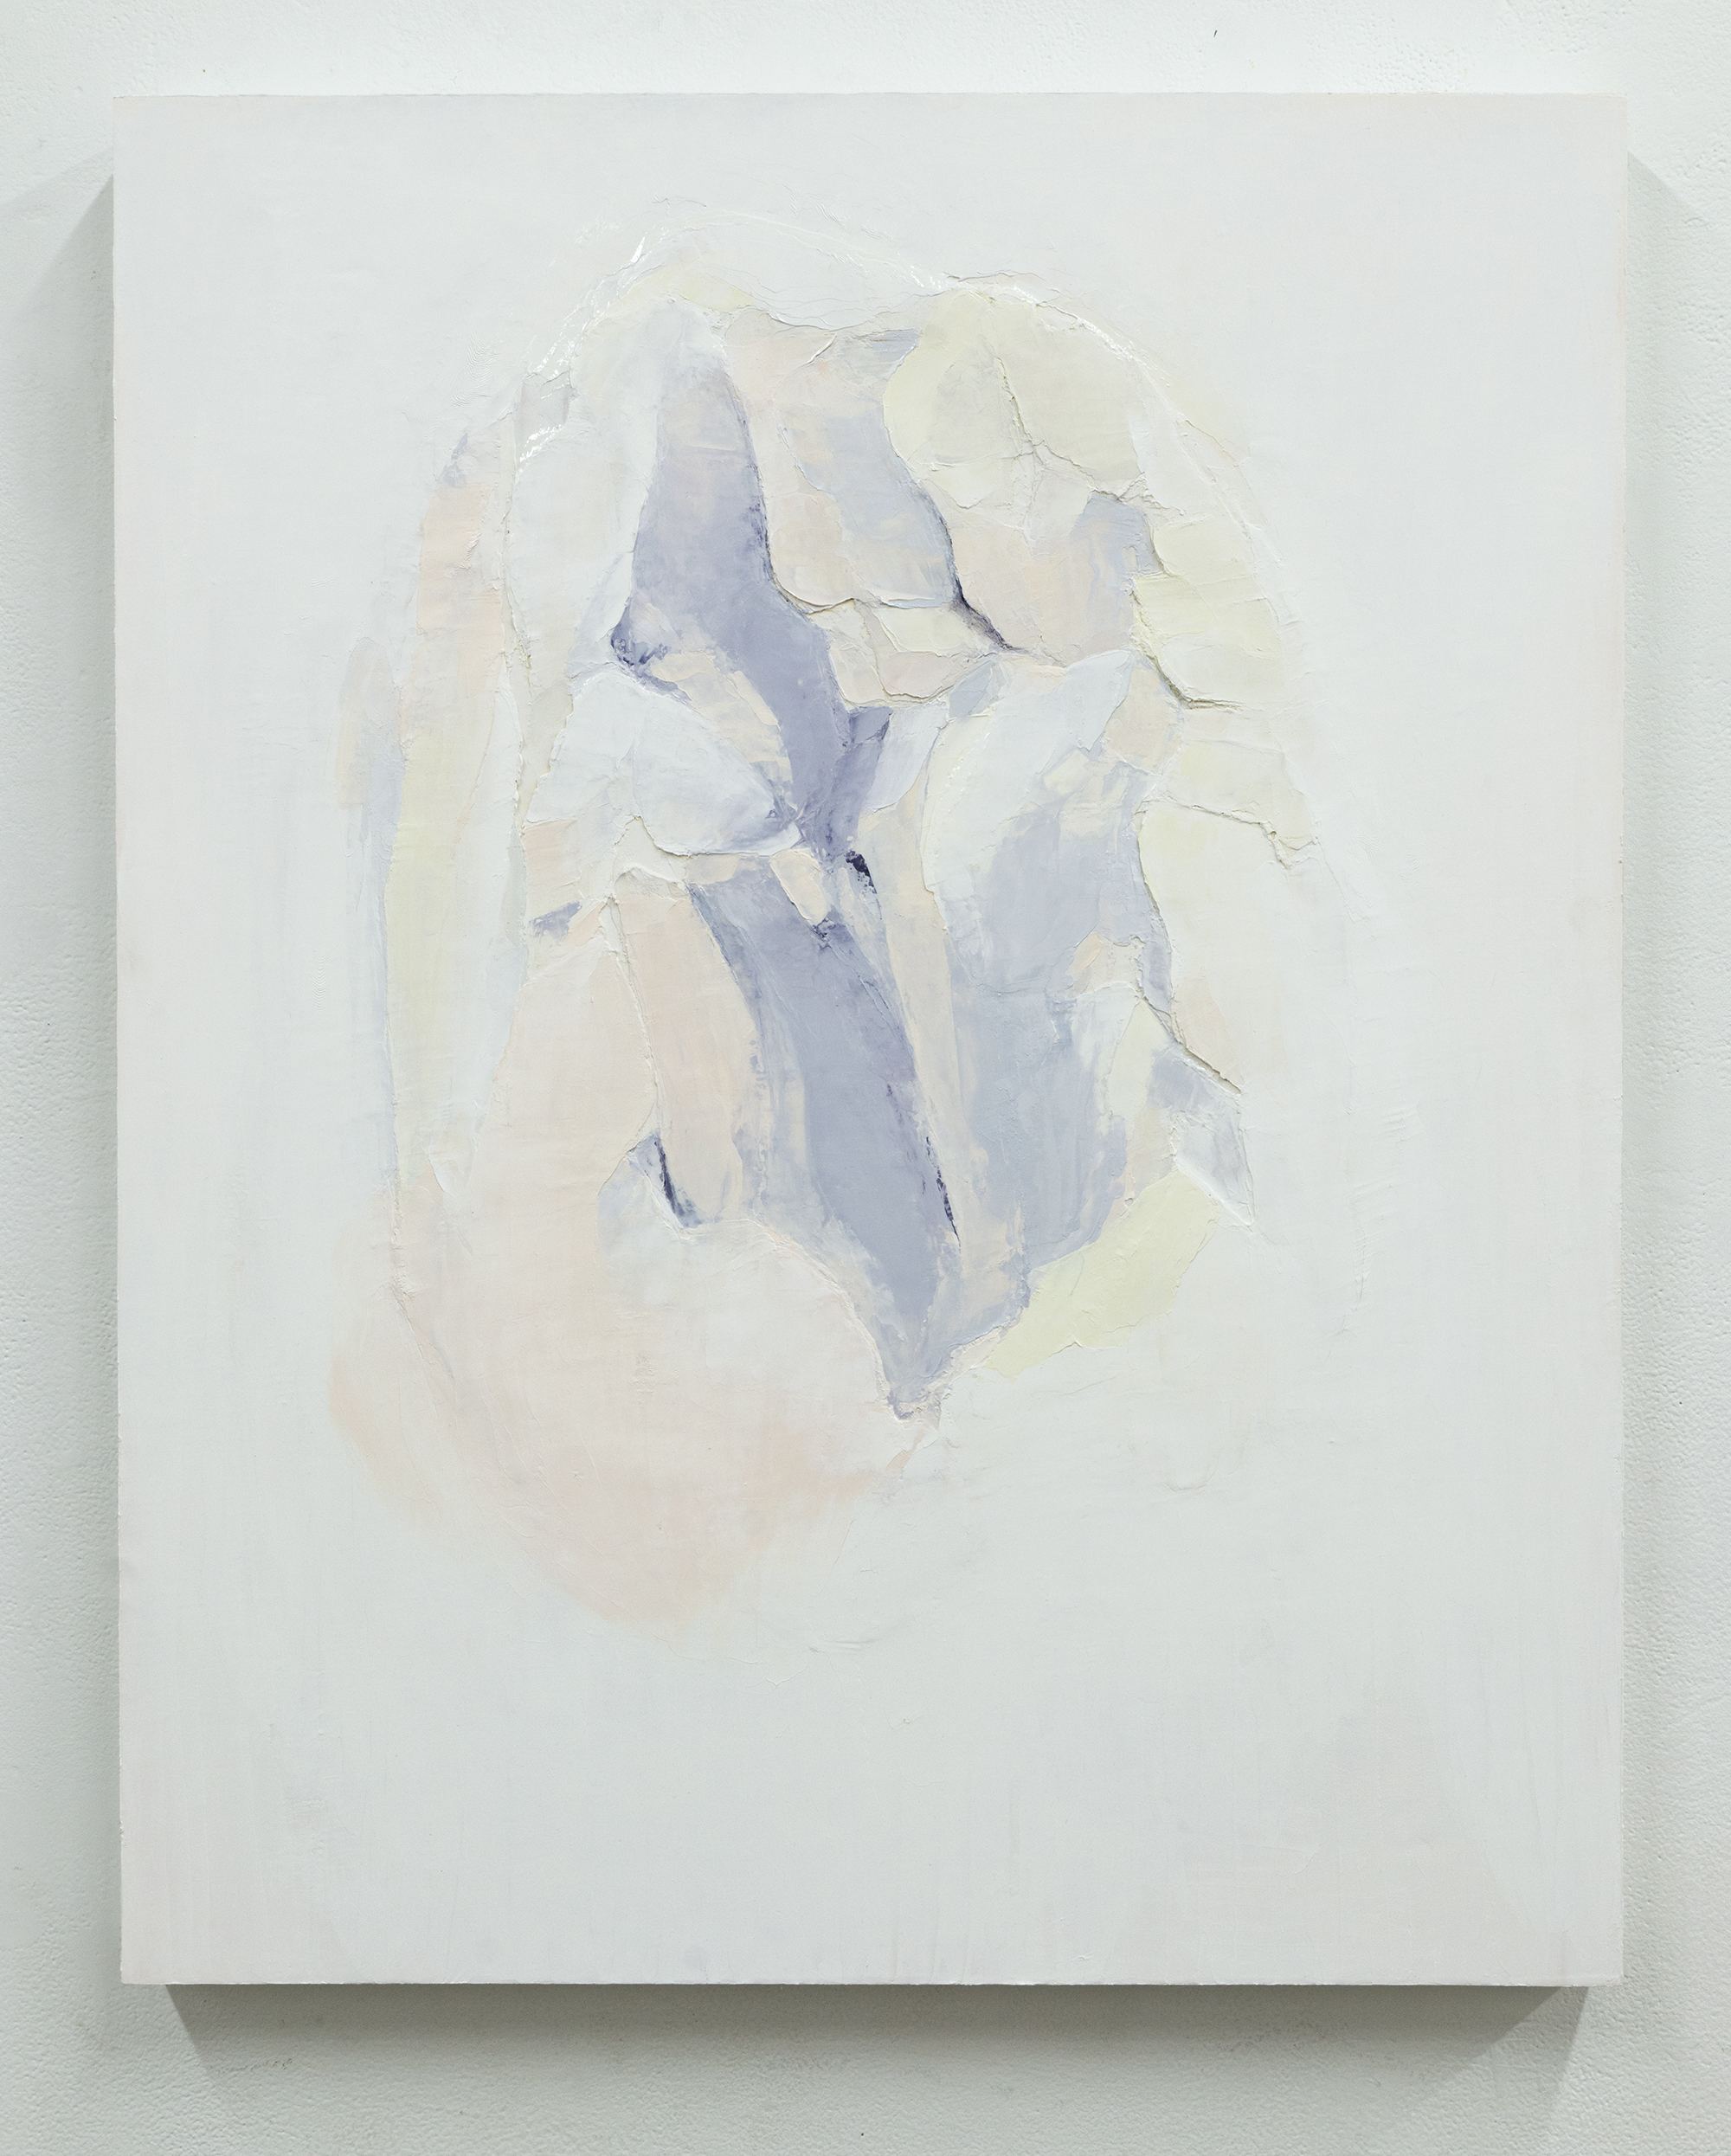 Untitled (Emerge), 2017